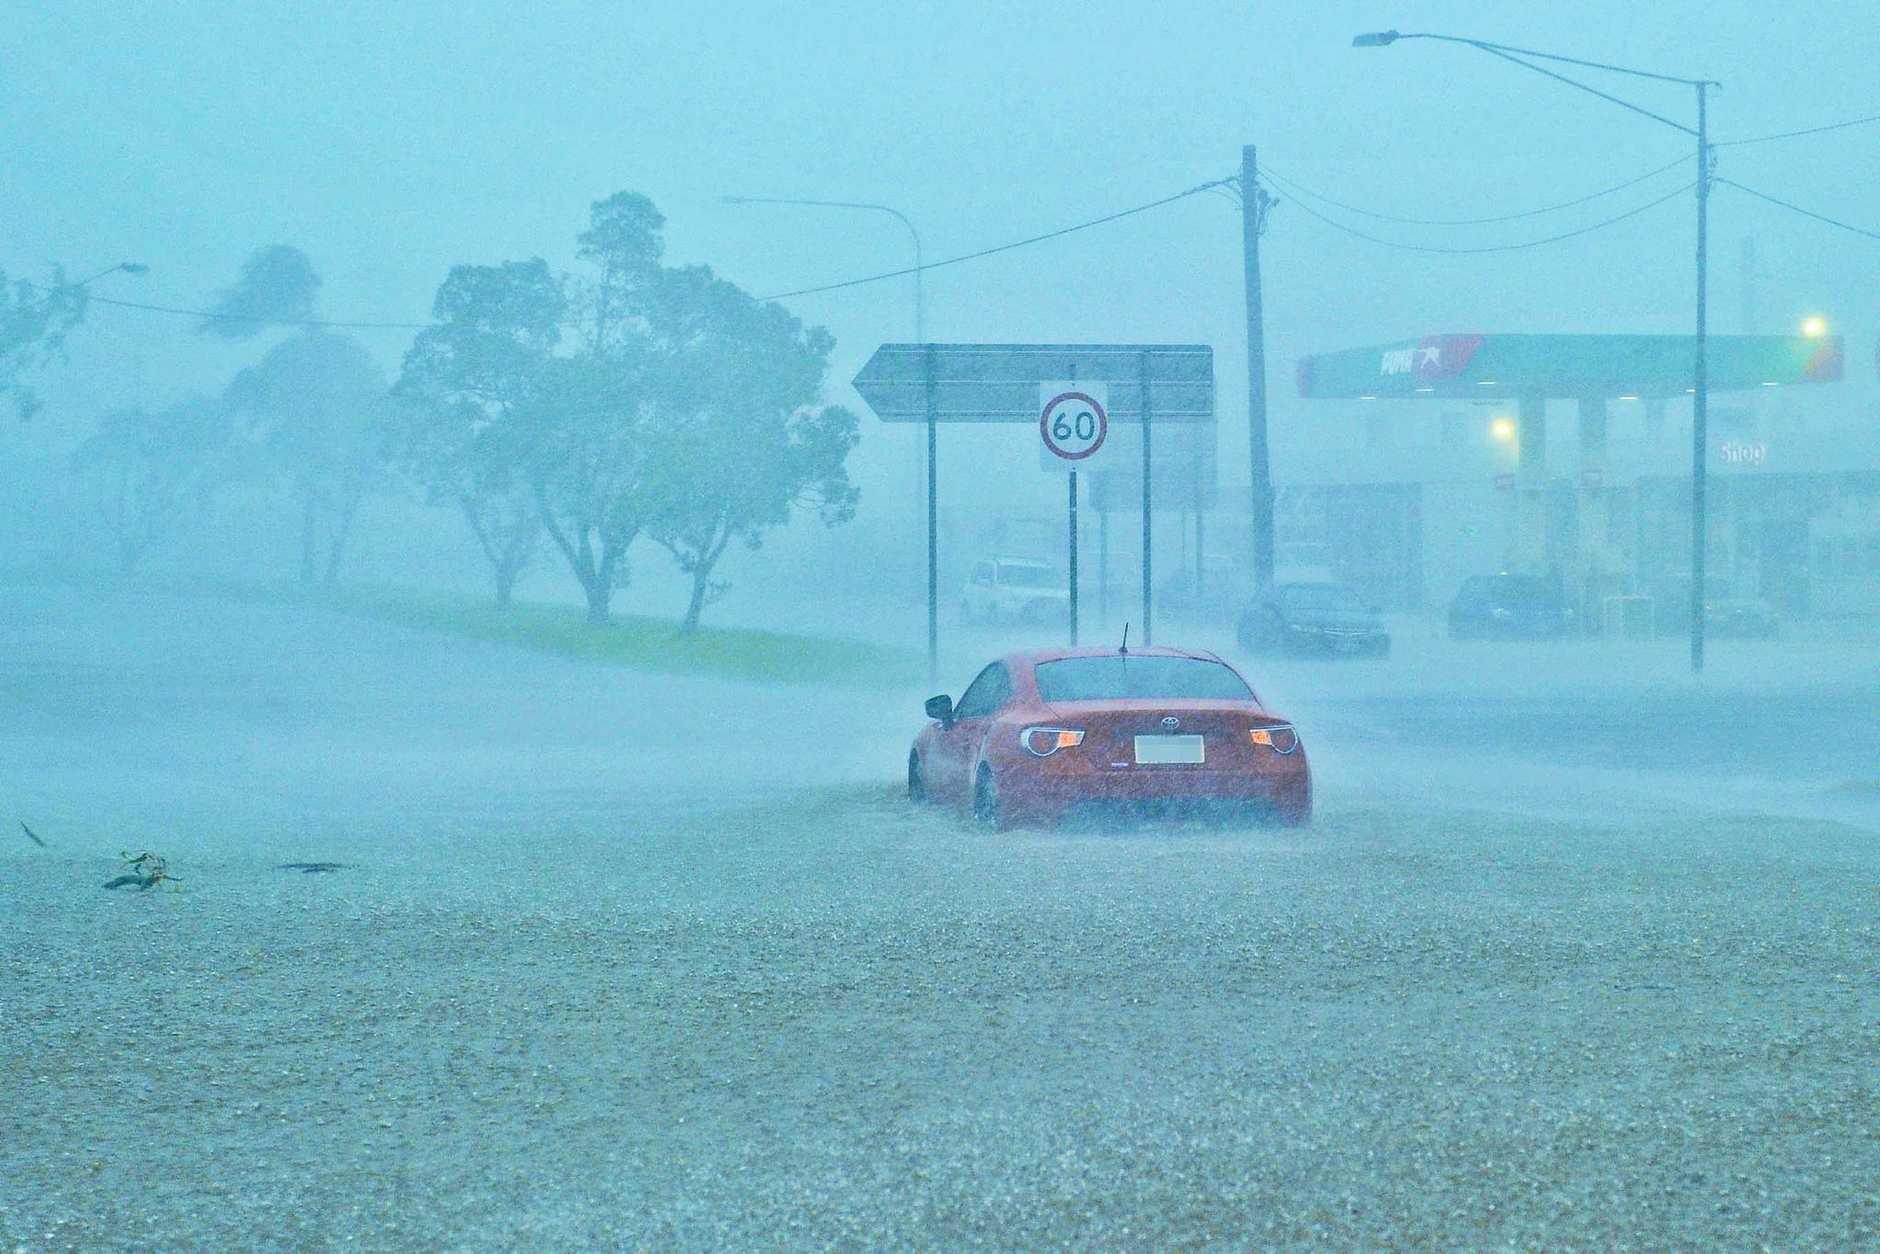 Gladstone's Dawson Rd was flooding as the aftermath of Cyclone Debbie swept through the region.